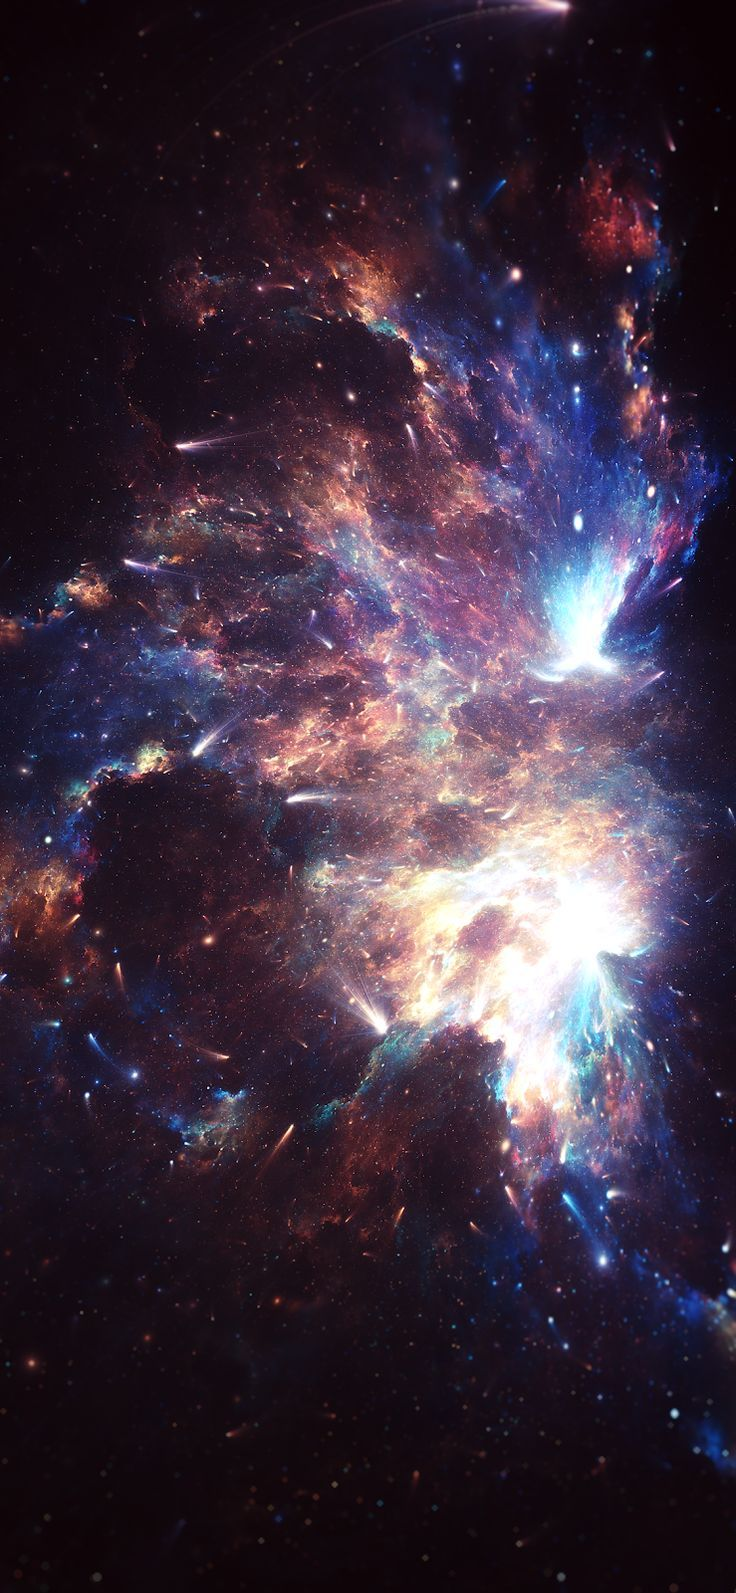 Colorful Nebula (iPhone X) – #Colorful #iPhone #Nebula – Picpin